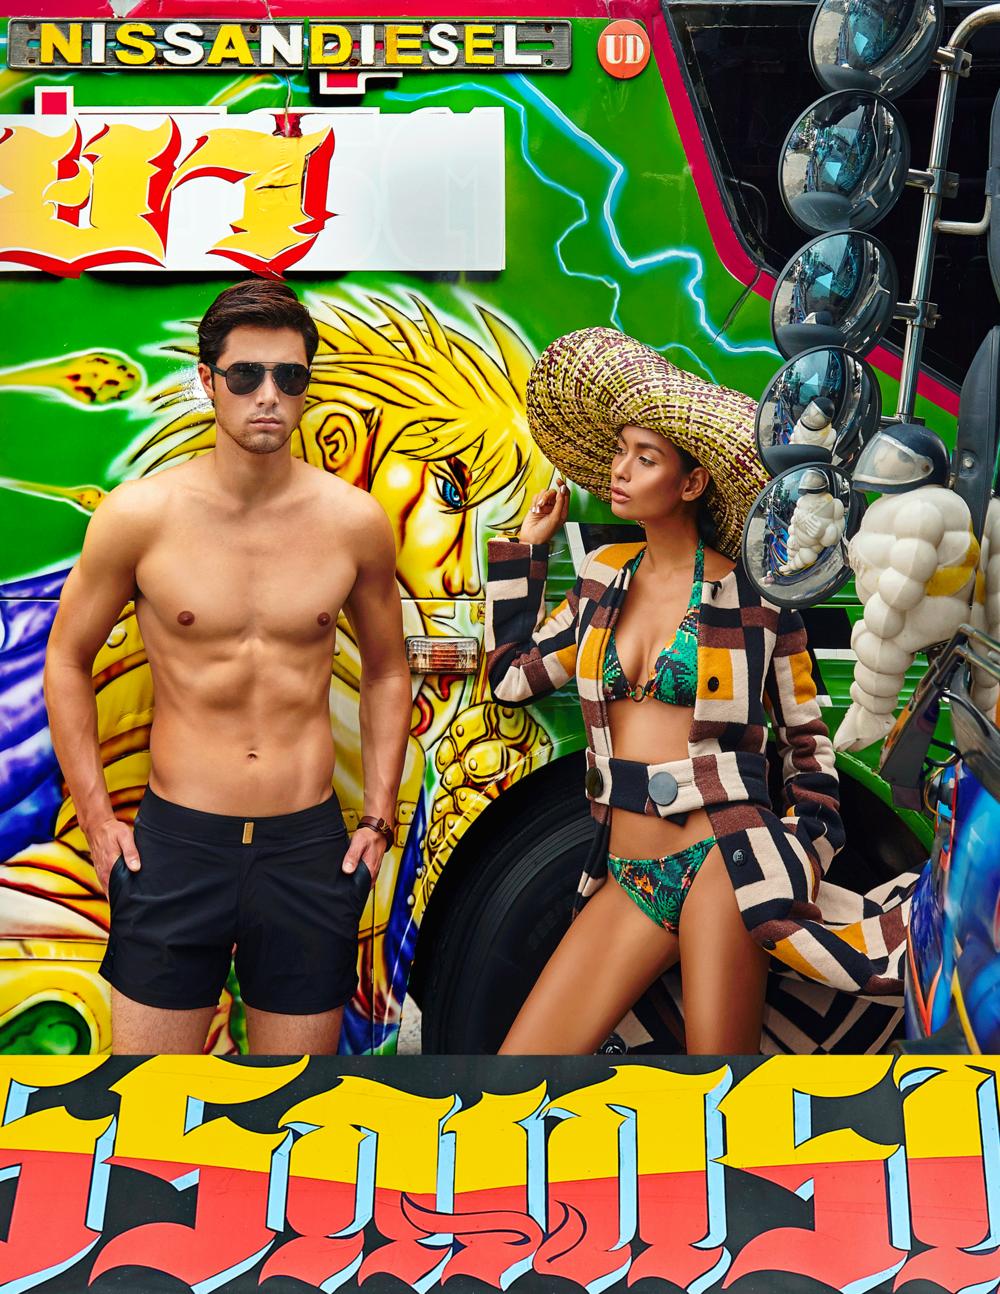 swimwear : Vilebrequin / coat : Salvatore Ferragamo / sunglasses : Dolce & Gabbana